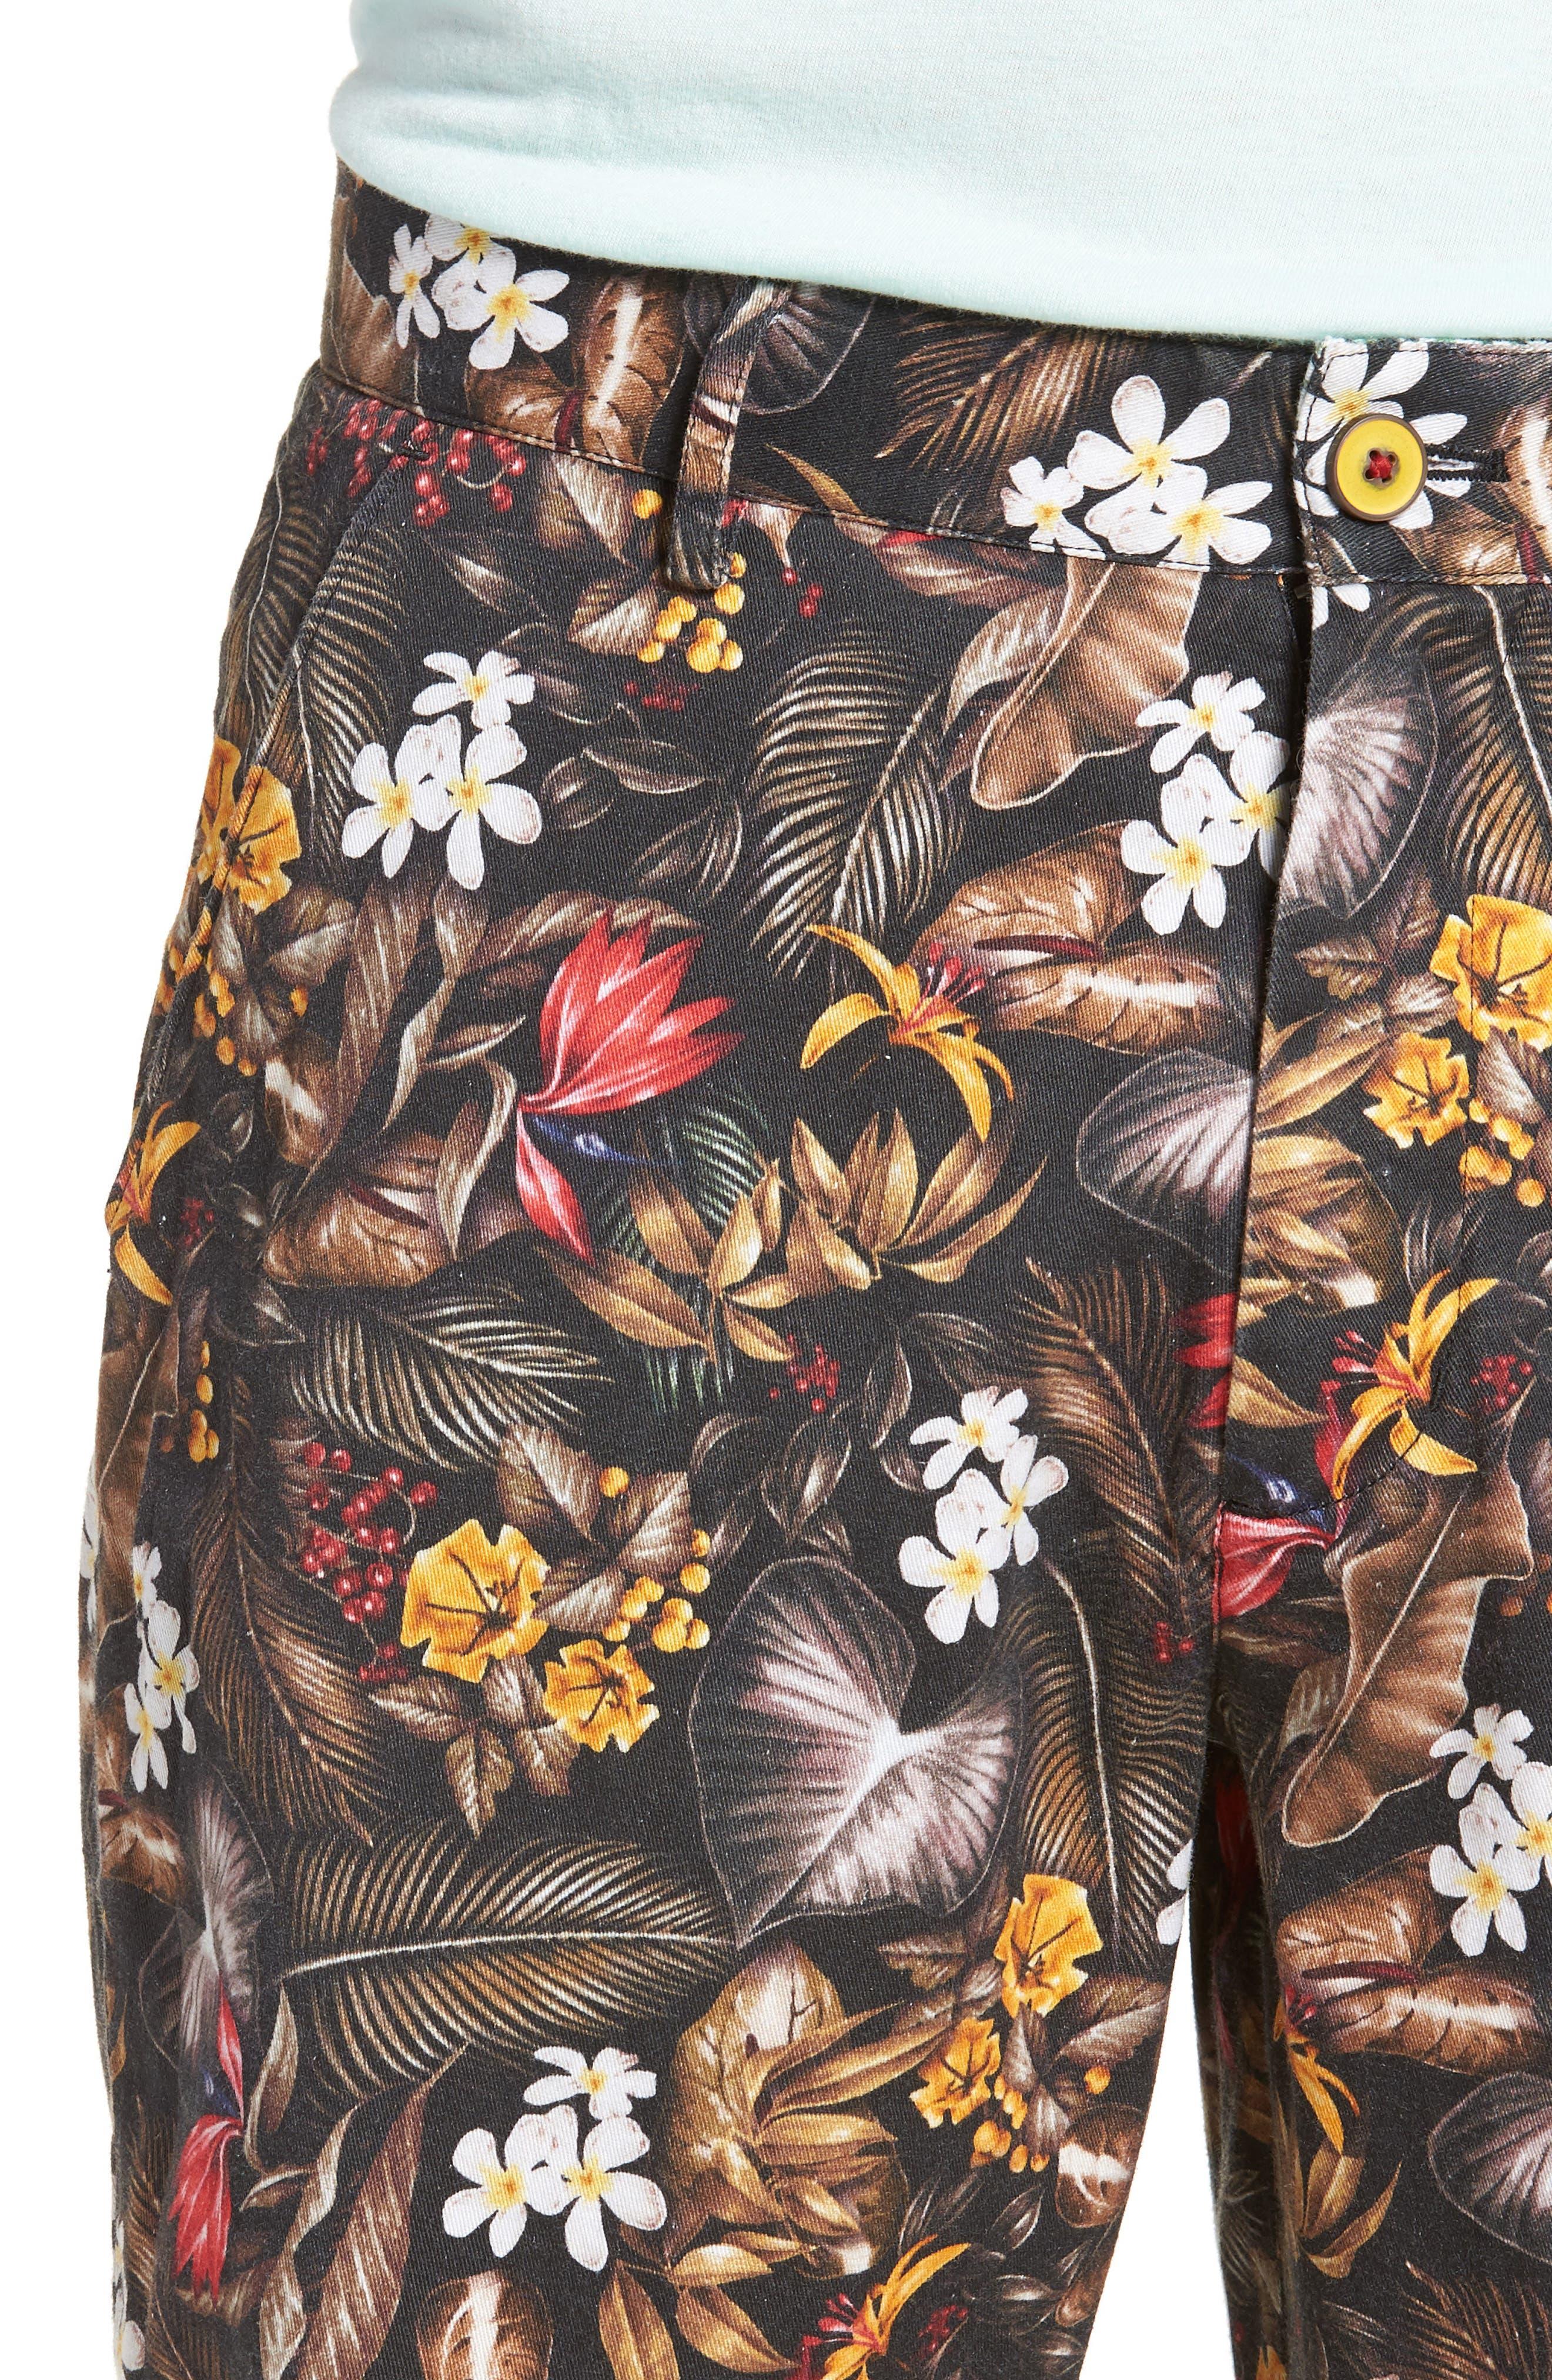 Maracas Woven Shorts,                             Alternate thumbnail 3, color,                             Multi